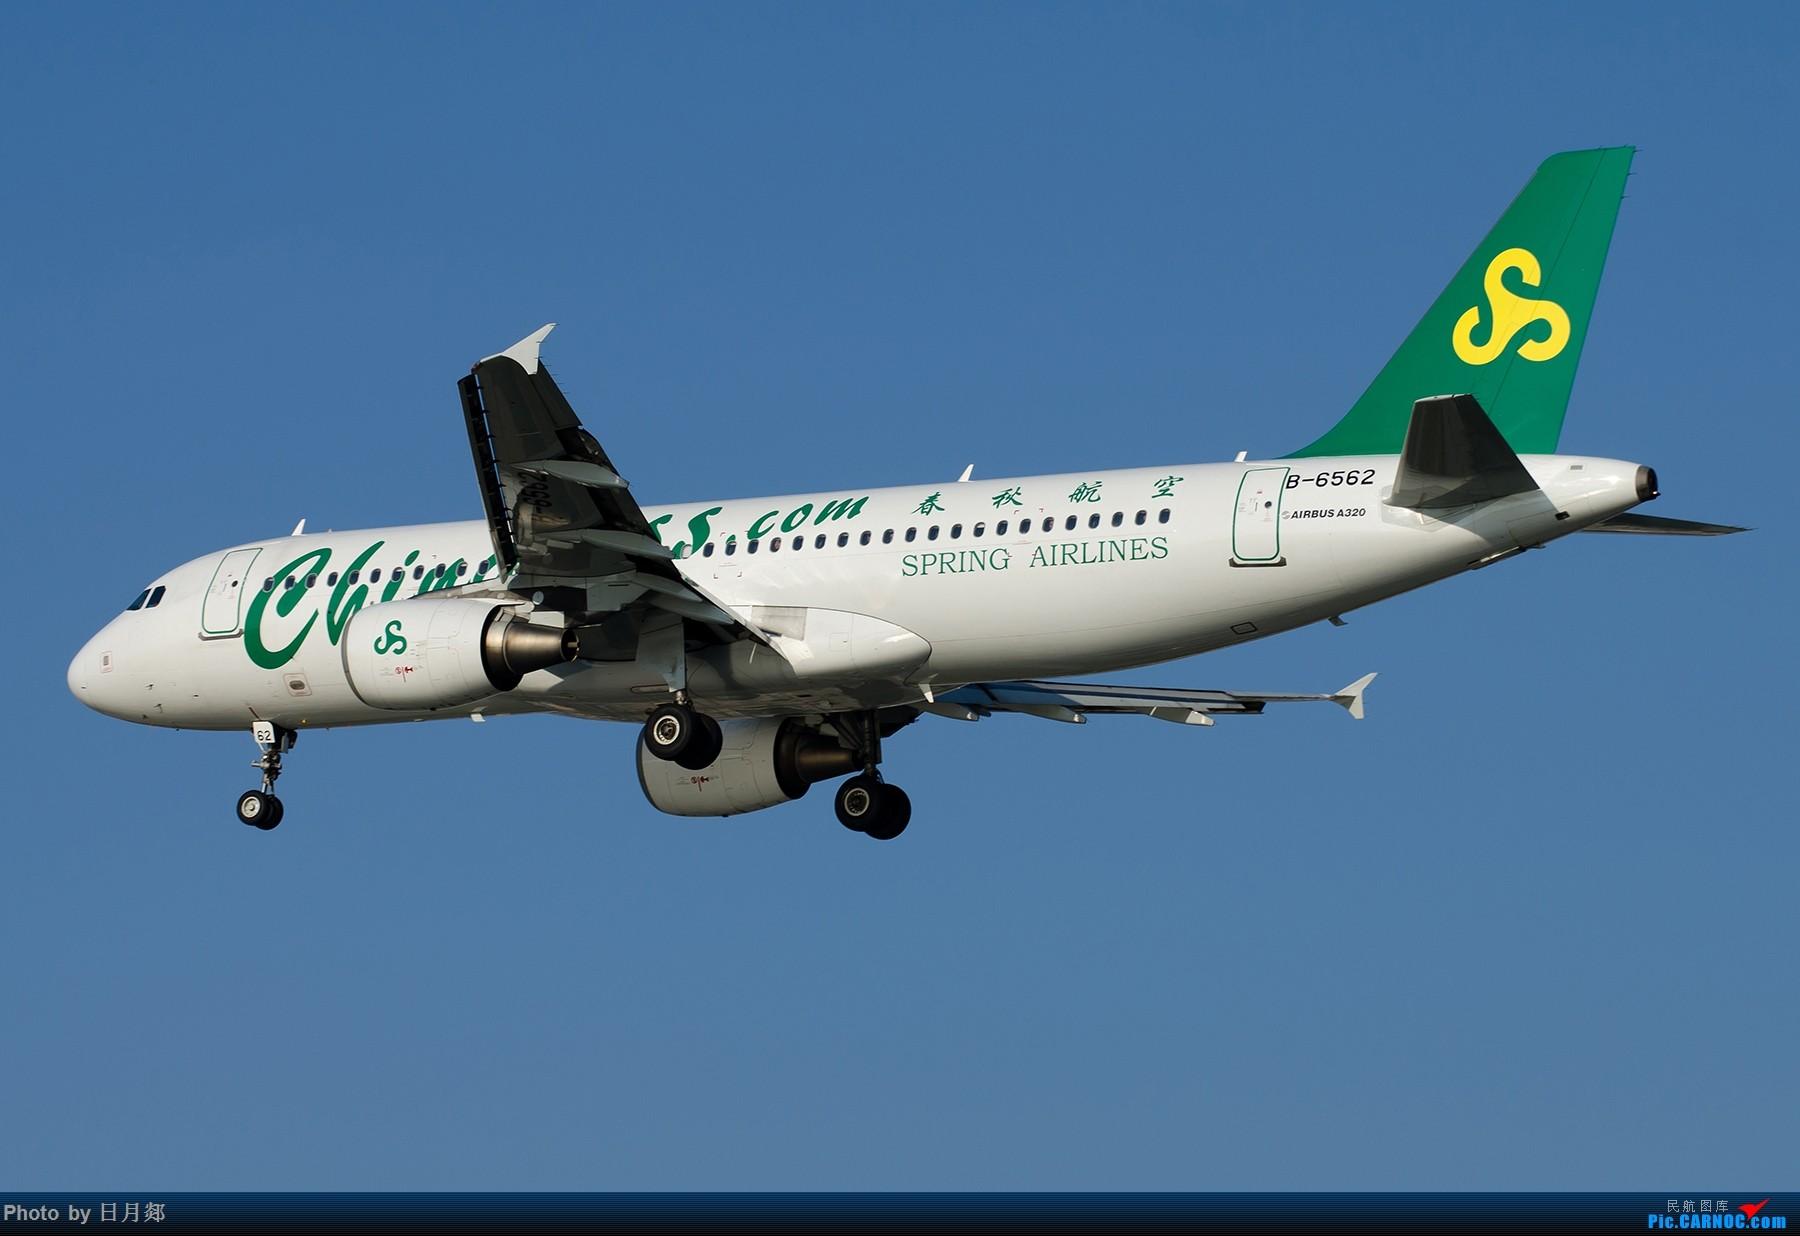 Re:[原创]【SHA拍机*1800大图】轻度污染来临前宝贵的蓝天,且拍且珍惜 AIRBUS A320-200 B-6562 中国上海虹桥国际机场